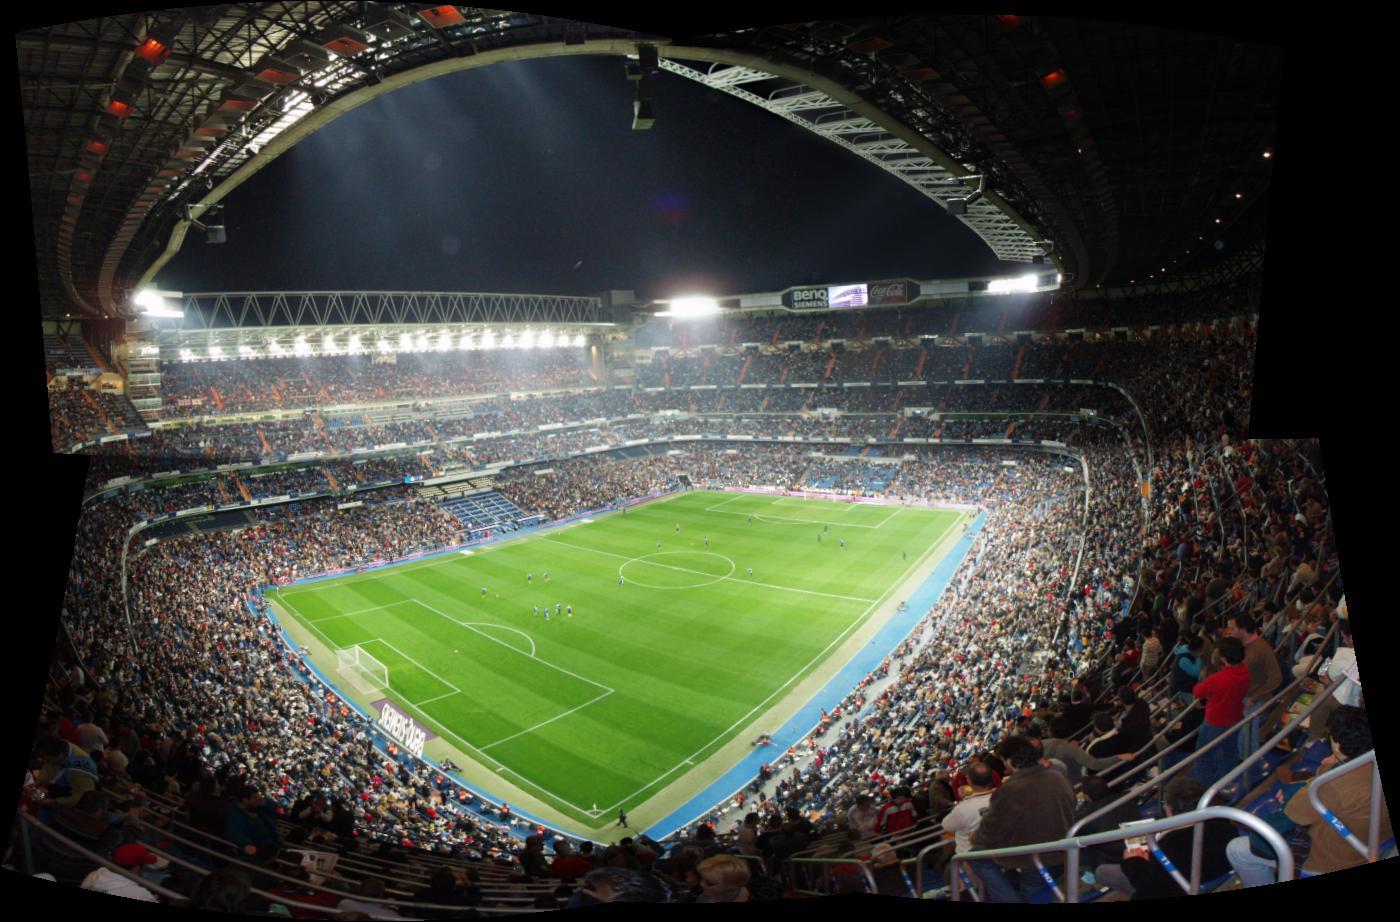 http://4.bp.blogspot.com/_HXBkmFylMqY/TI01XQM78fI/AAAAAAAAAAY/fqE4OioWU4Q/s1600/Panoramica_002_-_Estadio_Santiago_Bernabeu.jpg